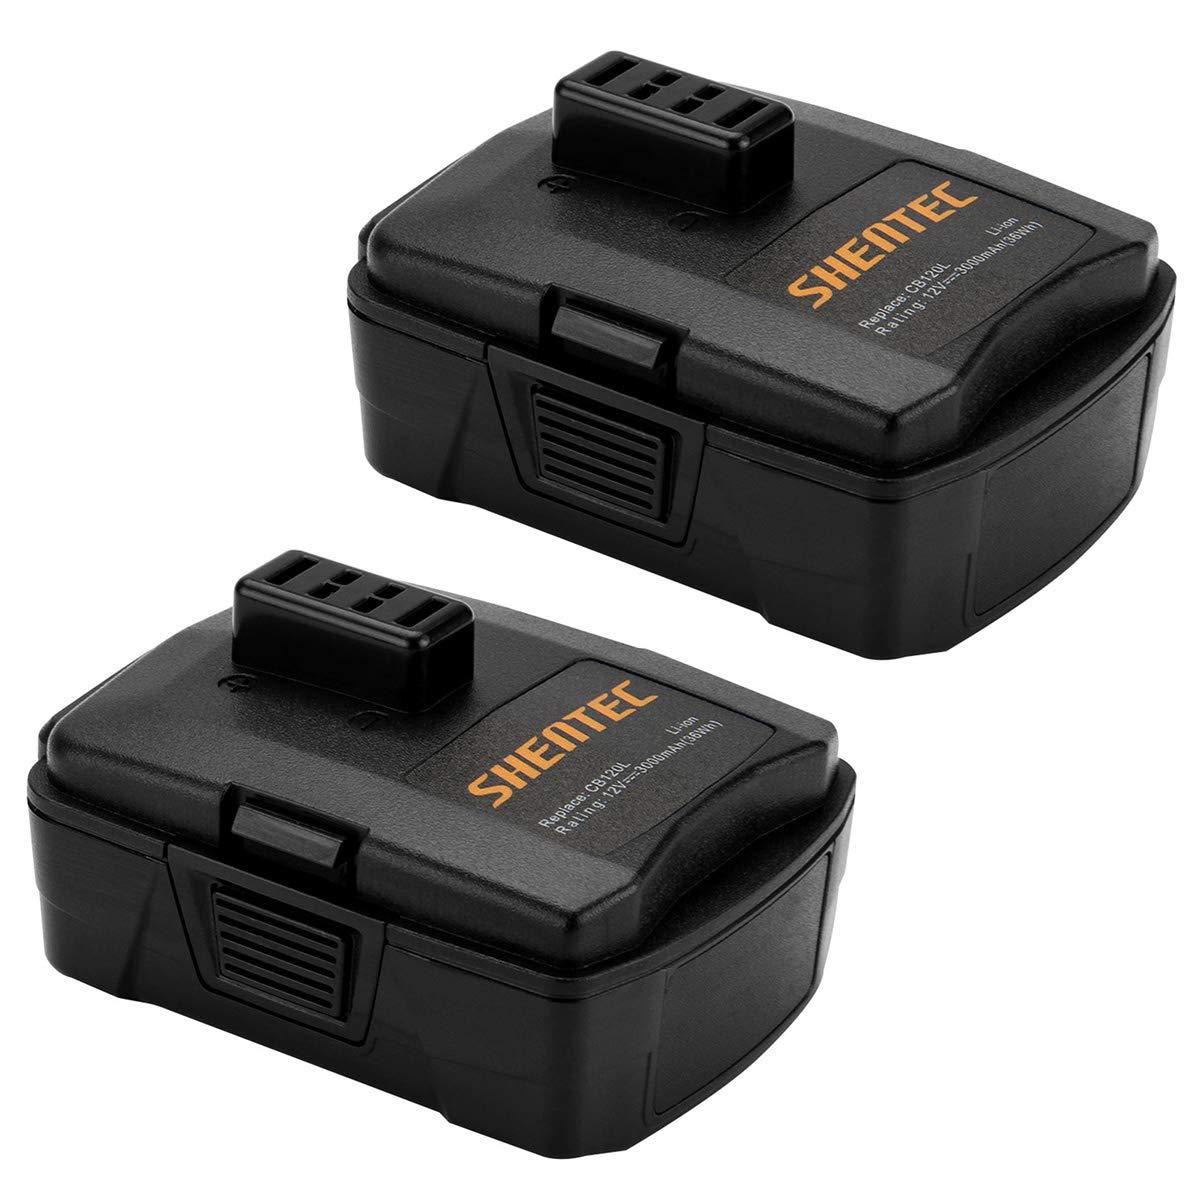 Shentec 2 Pack 3.0Ah 12V Battery Compatible with RYOBI CB120L CB121L BPL-1220 130503001 130503005, 12V Lithium Battery (NOT for CB120N)